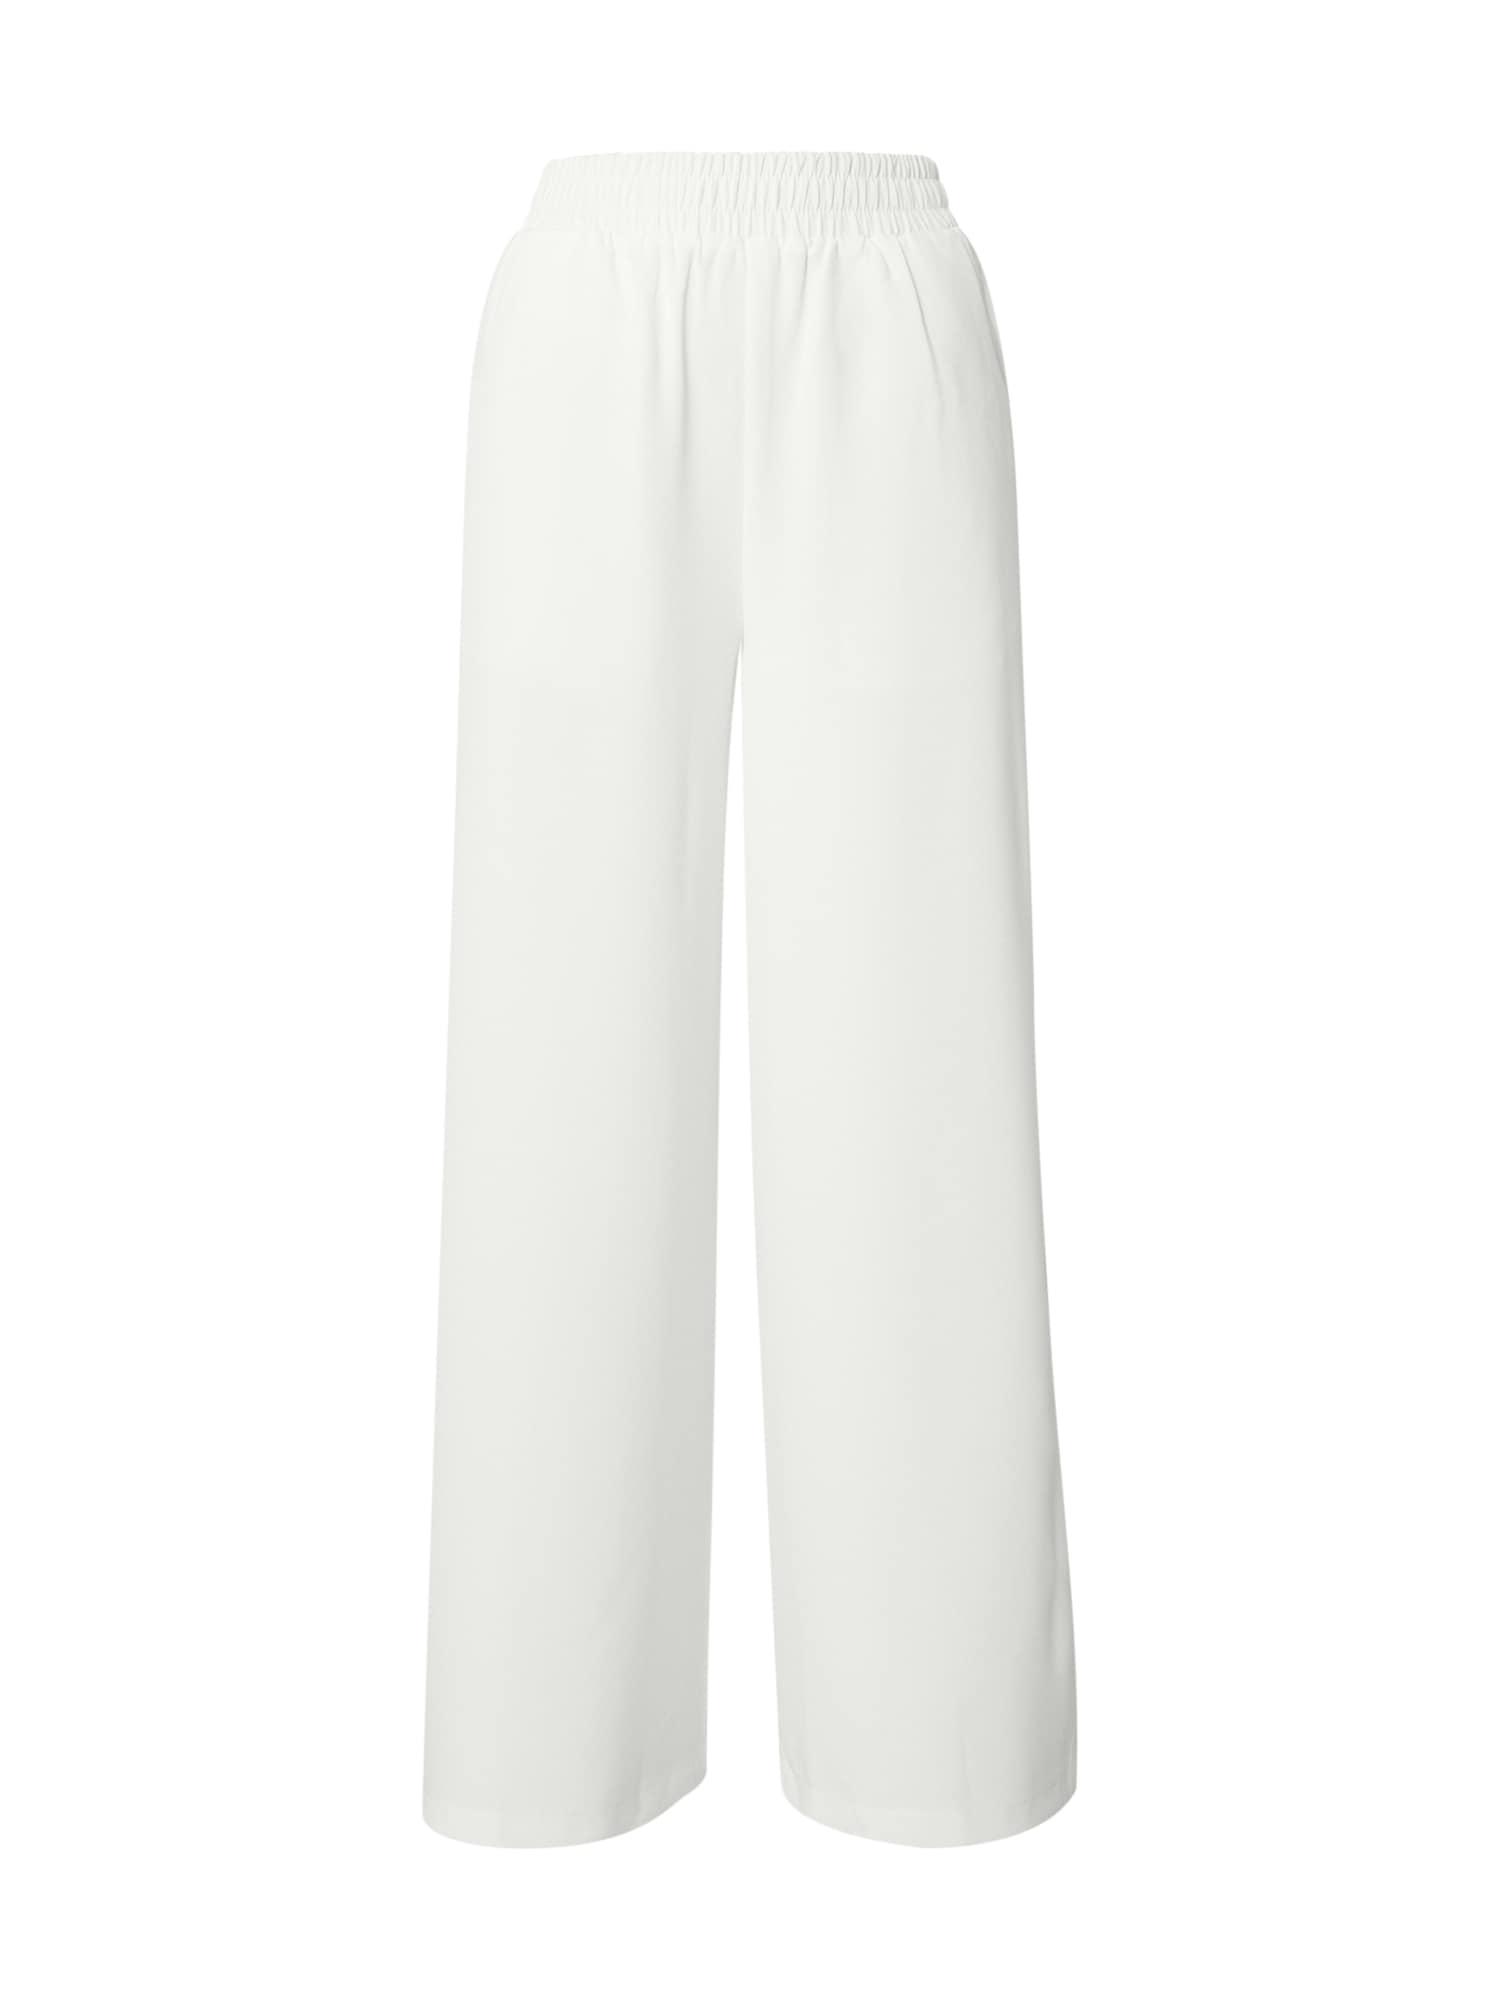 4th & Reckless Chino stiliaus kelnės balta